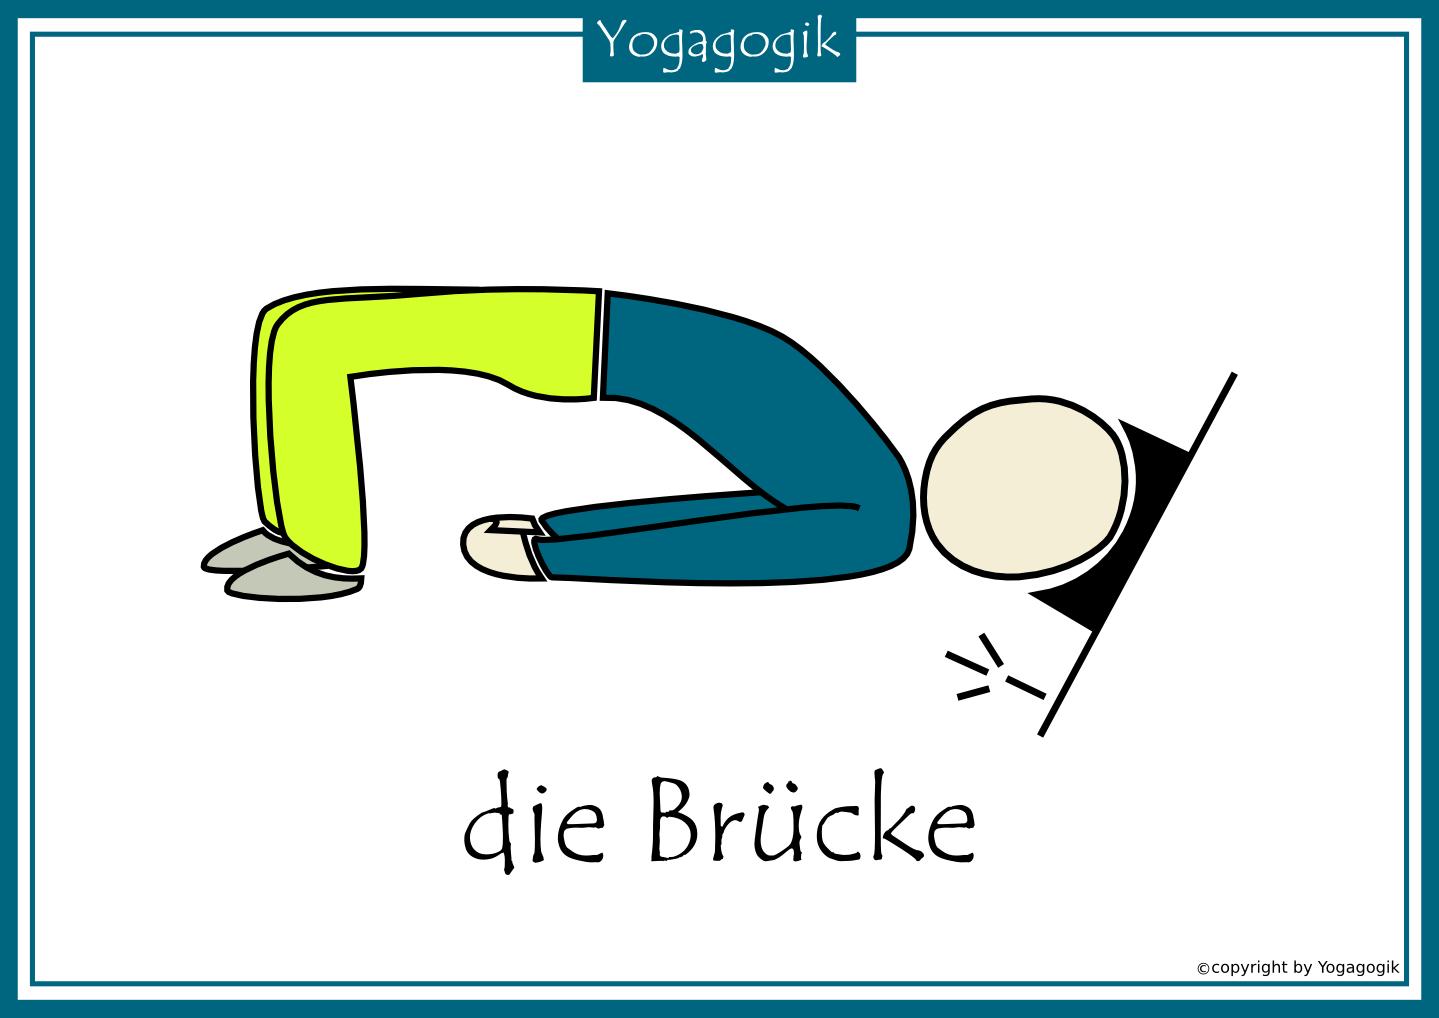 Flashcards classic kinderyoga ausbildung berlin yogagogik - Weihnachtskarte spanisch ...